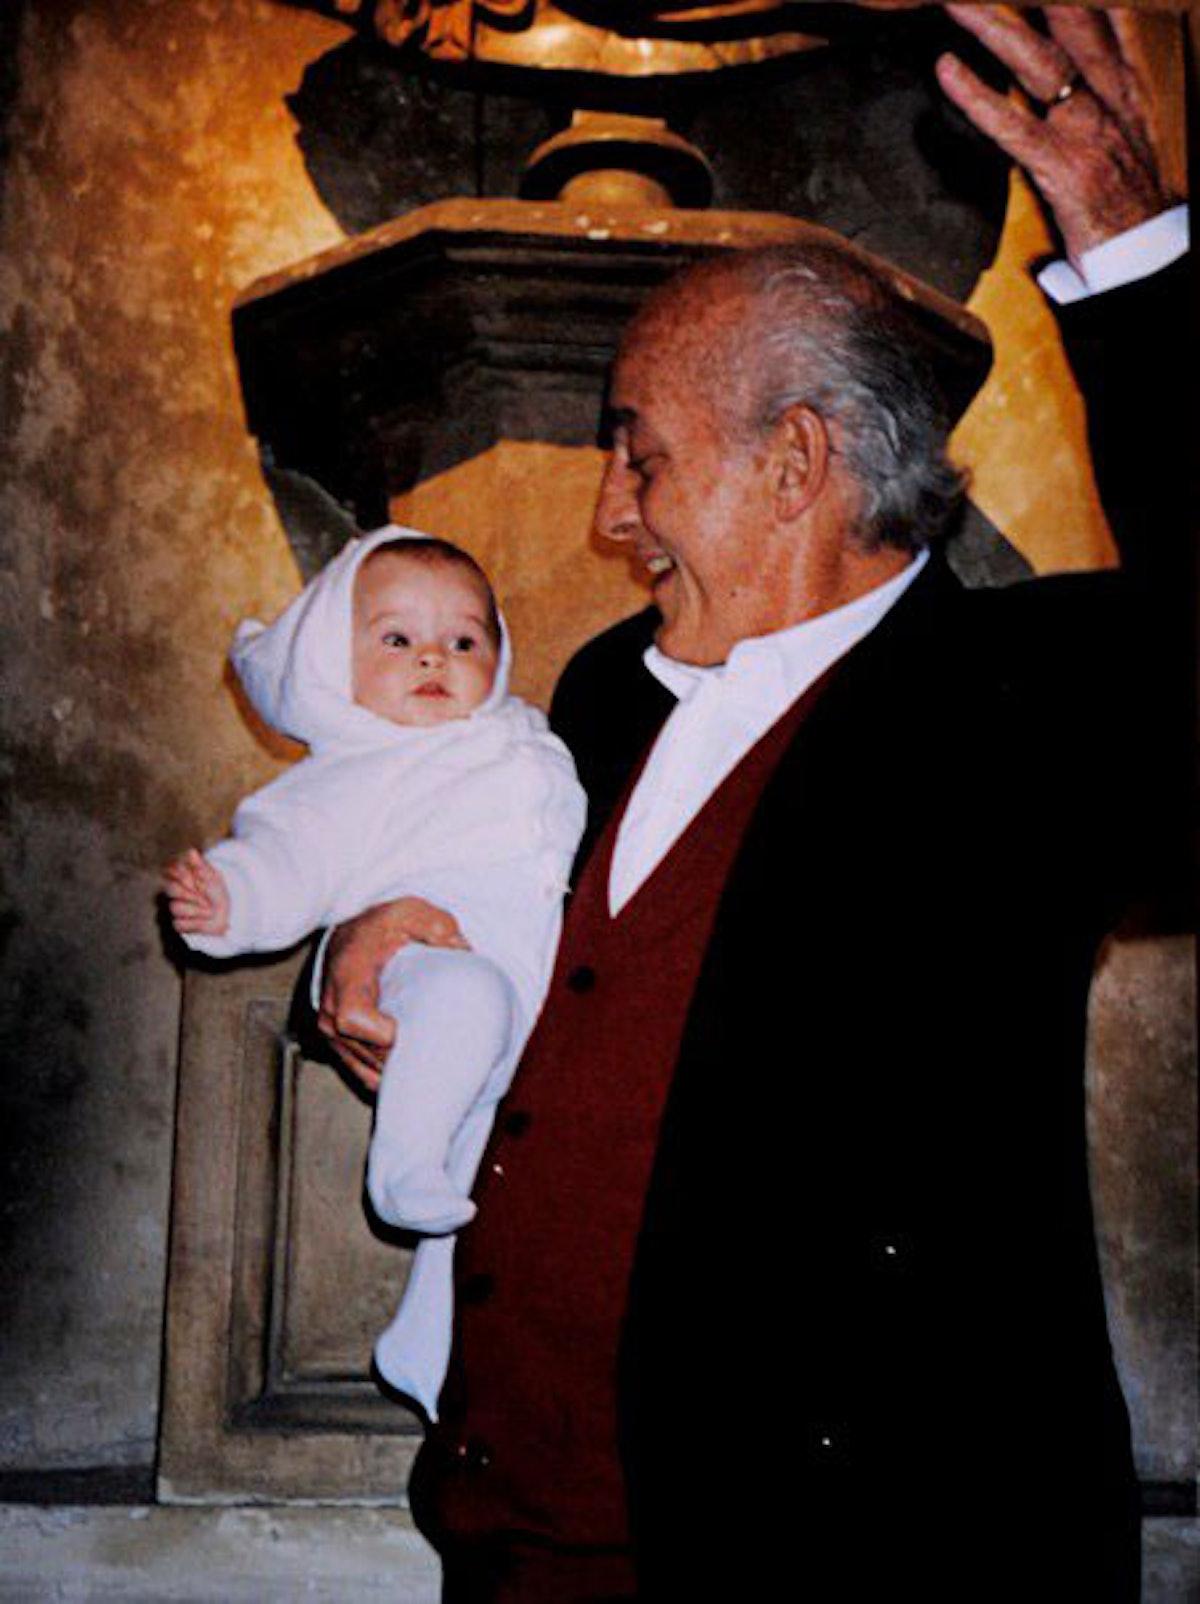 Melusine Ruspoli with her father